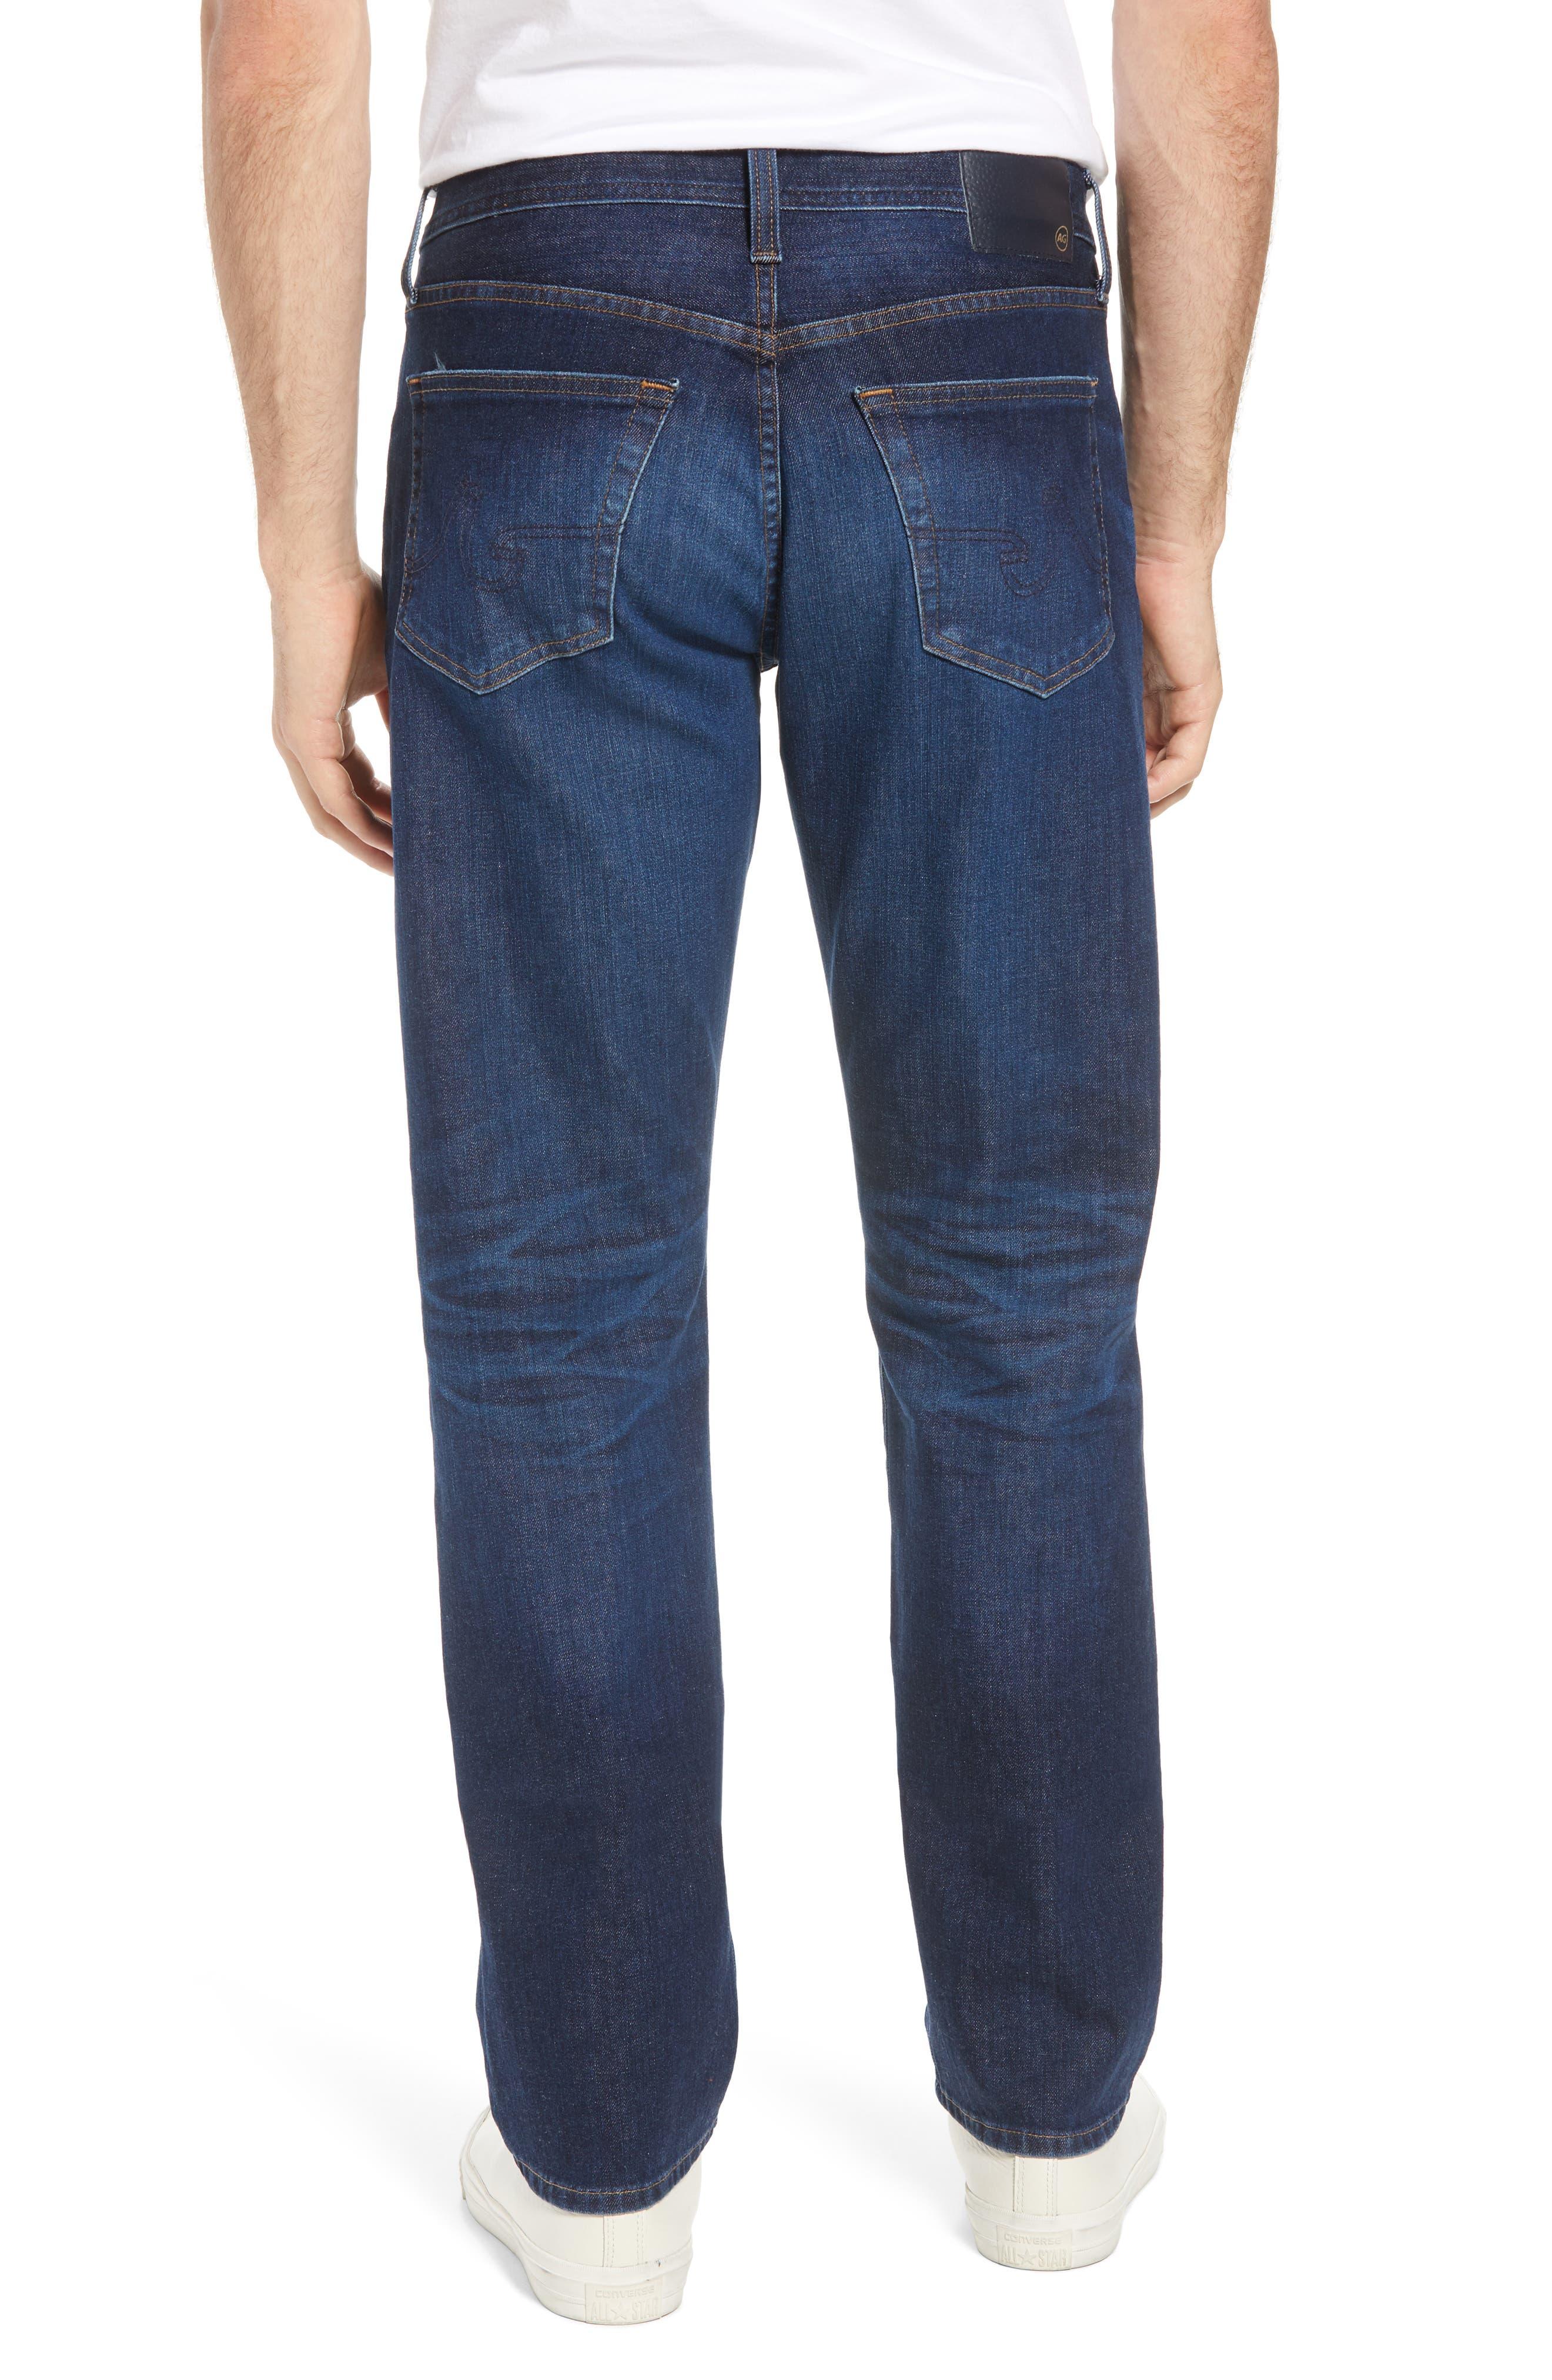 Graduate Slim Straight Fit Jeans,                             Alternate thumbnail 2, color,                             5 Years Lost Coast